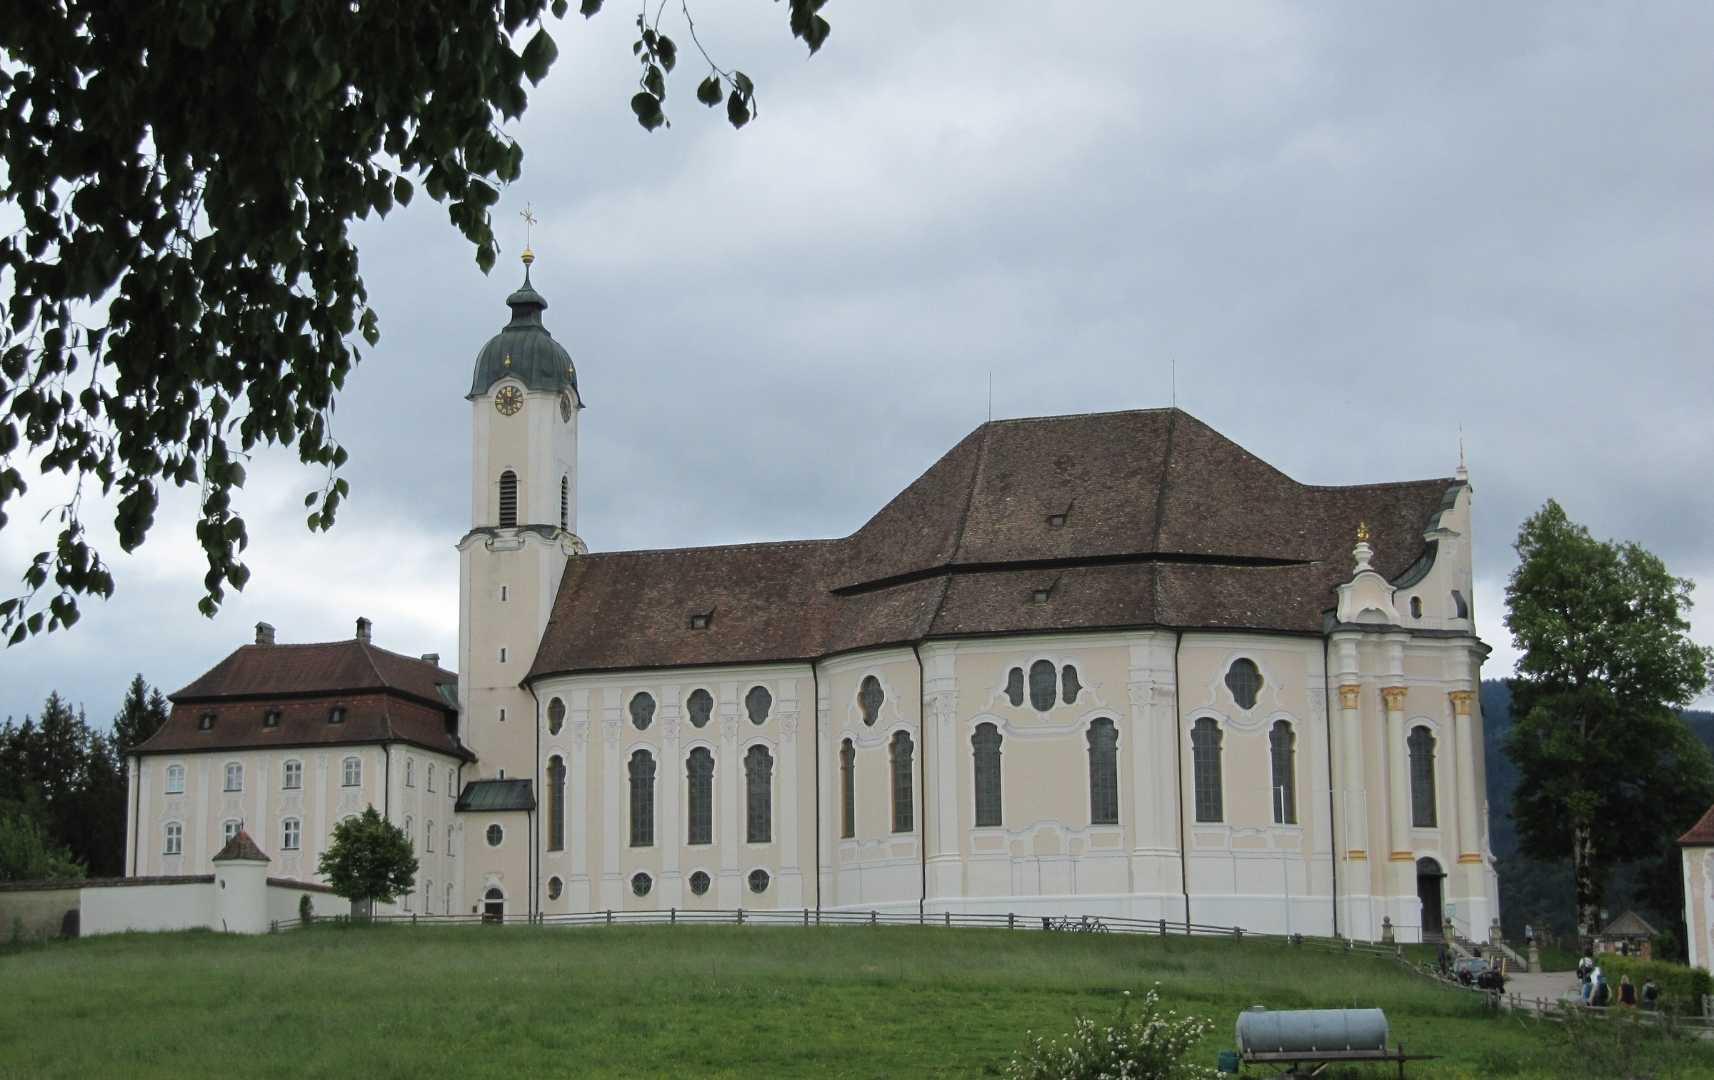 Wieskirche - Urlaub in Bayern